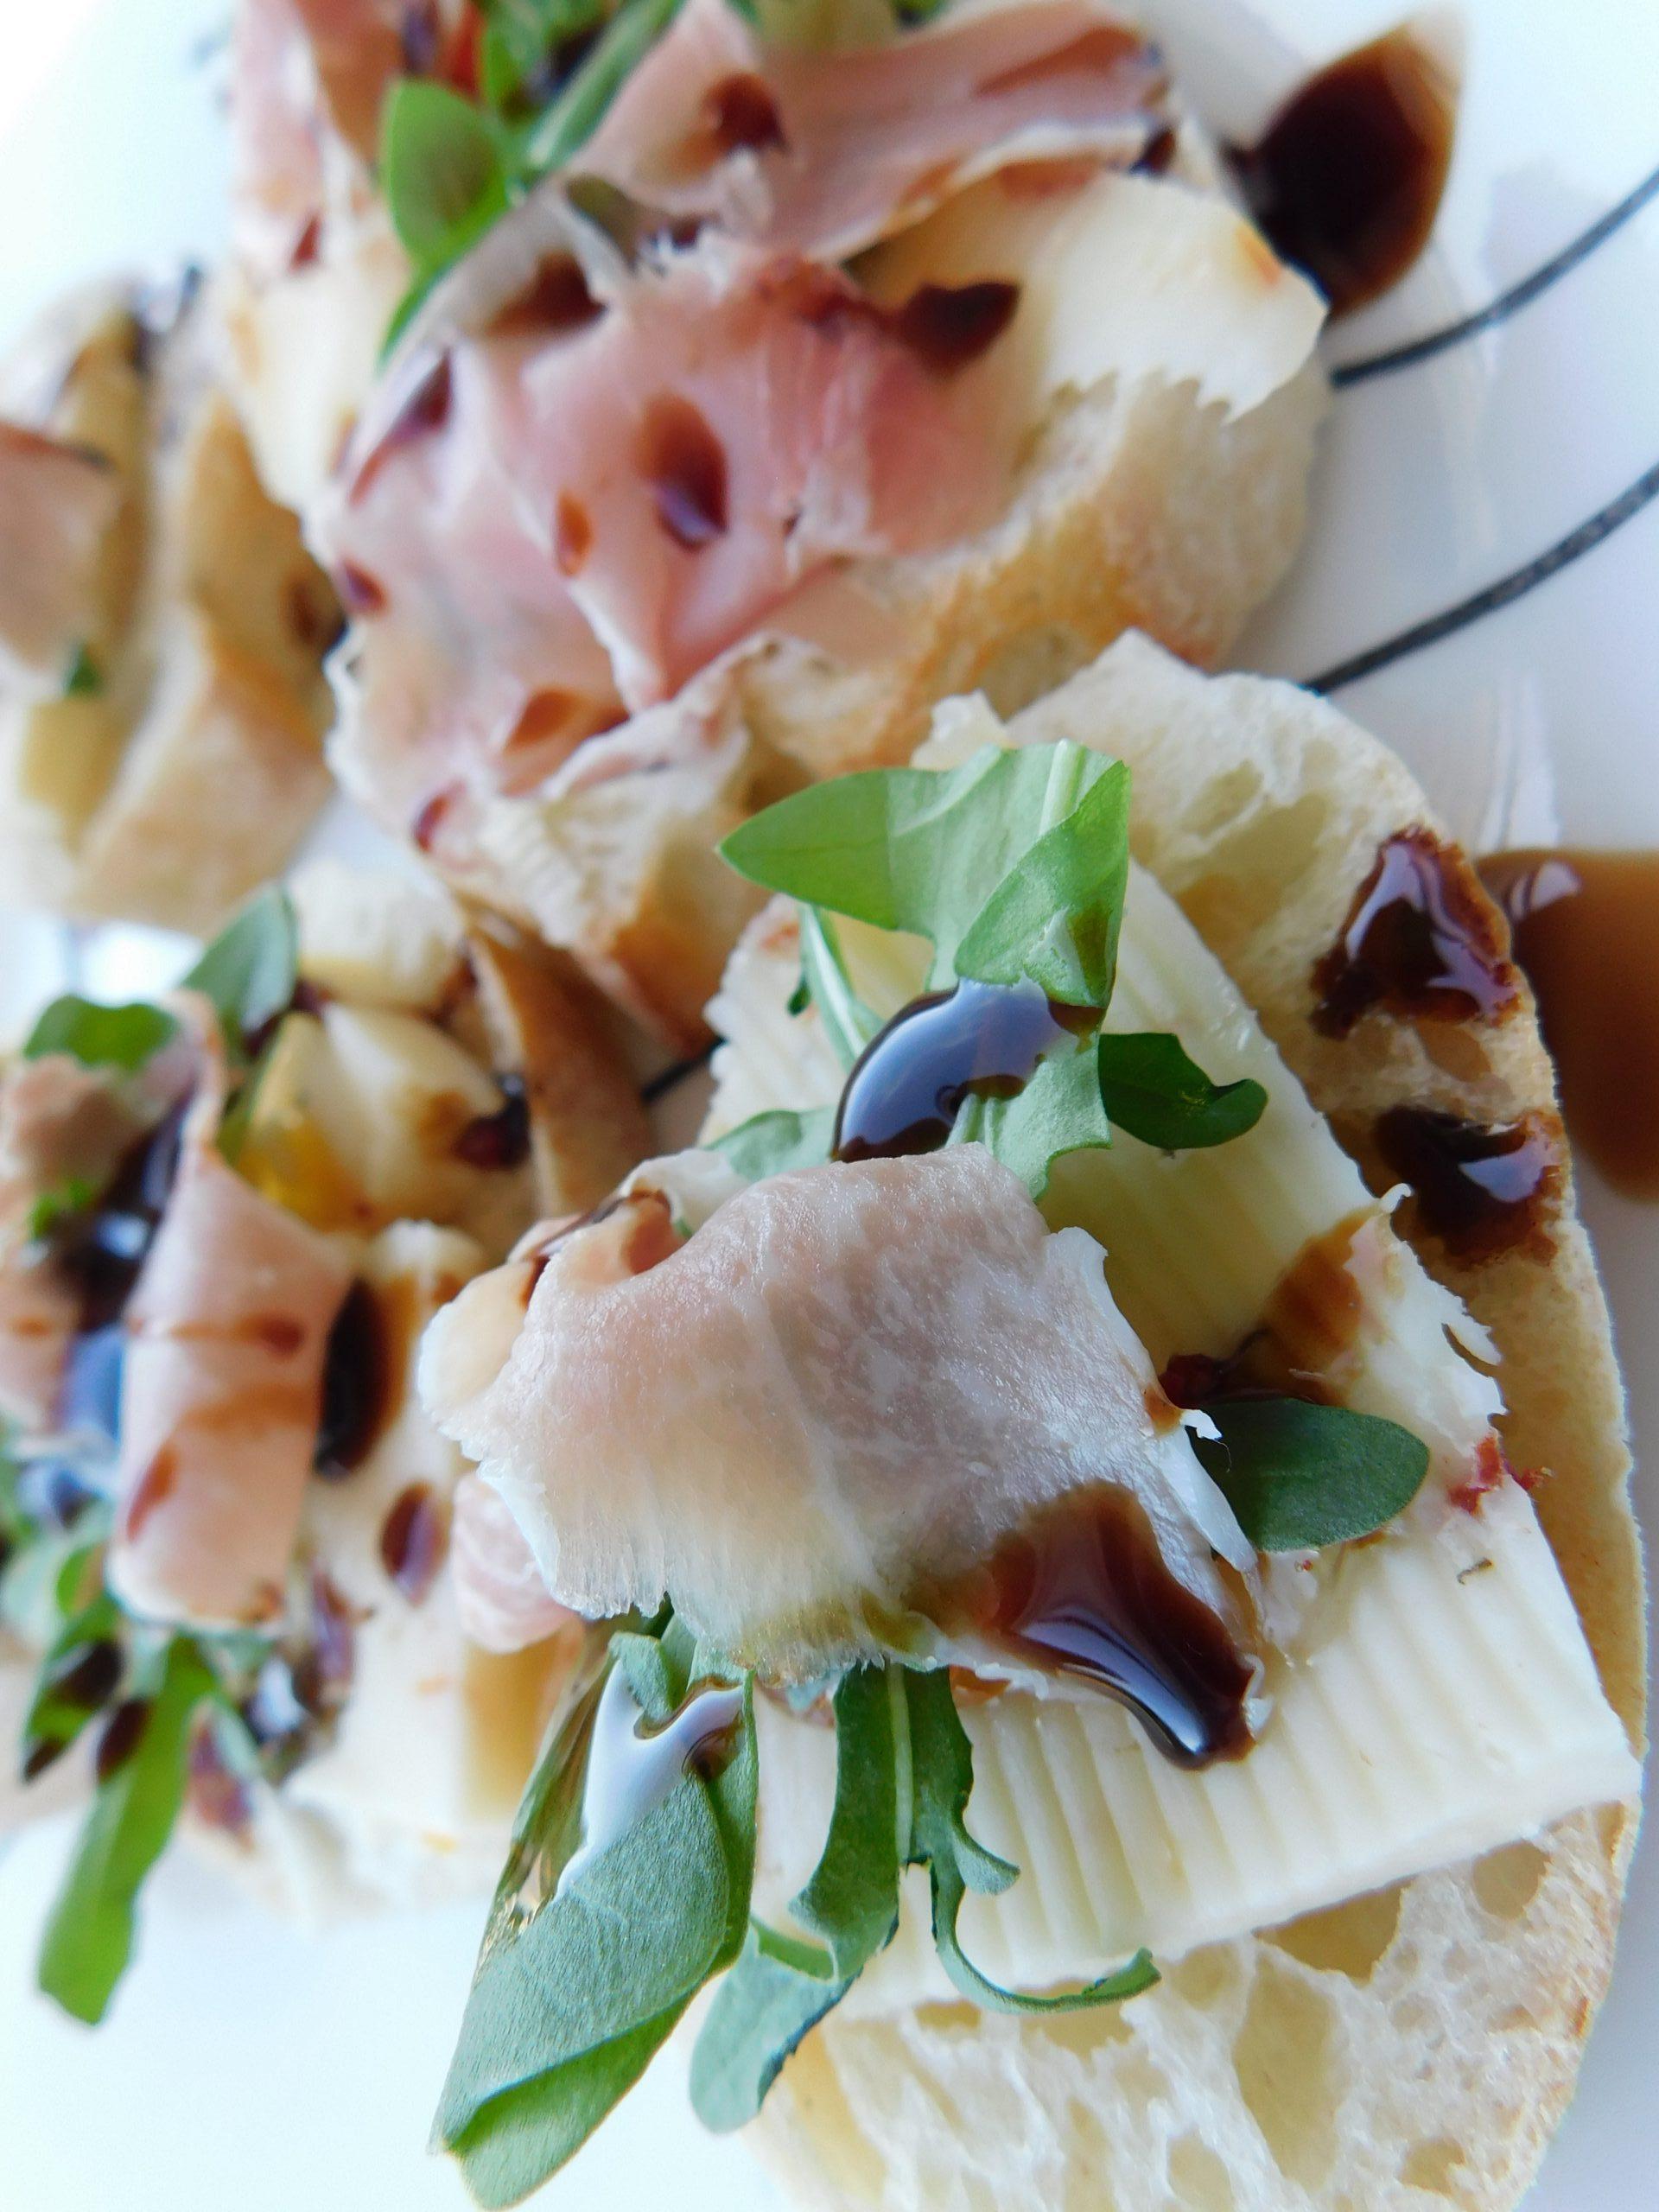 5 Crostini Appetizers to Make with Prosciutto